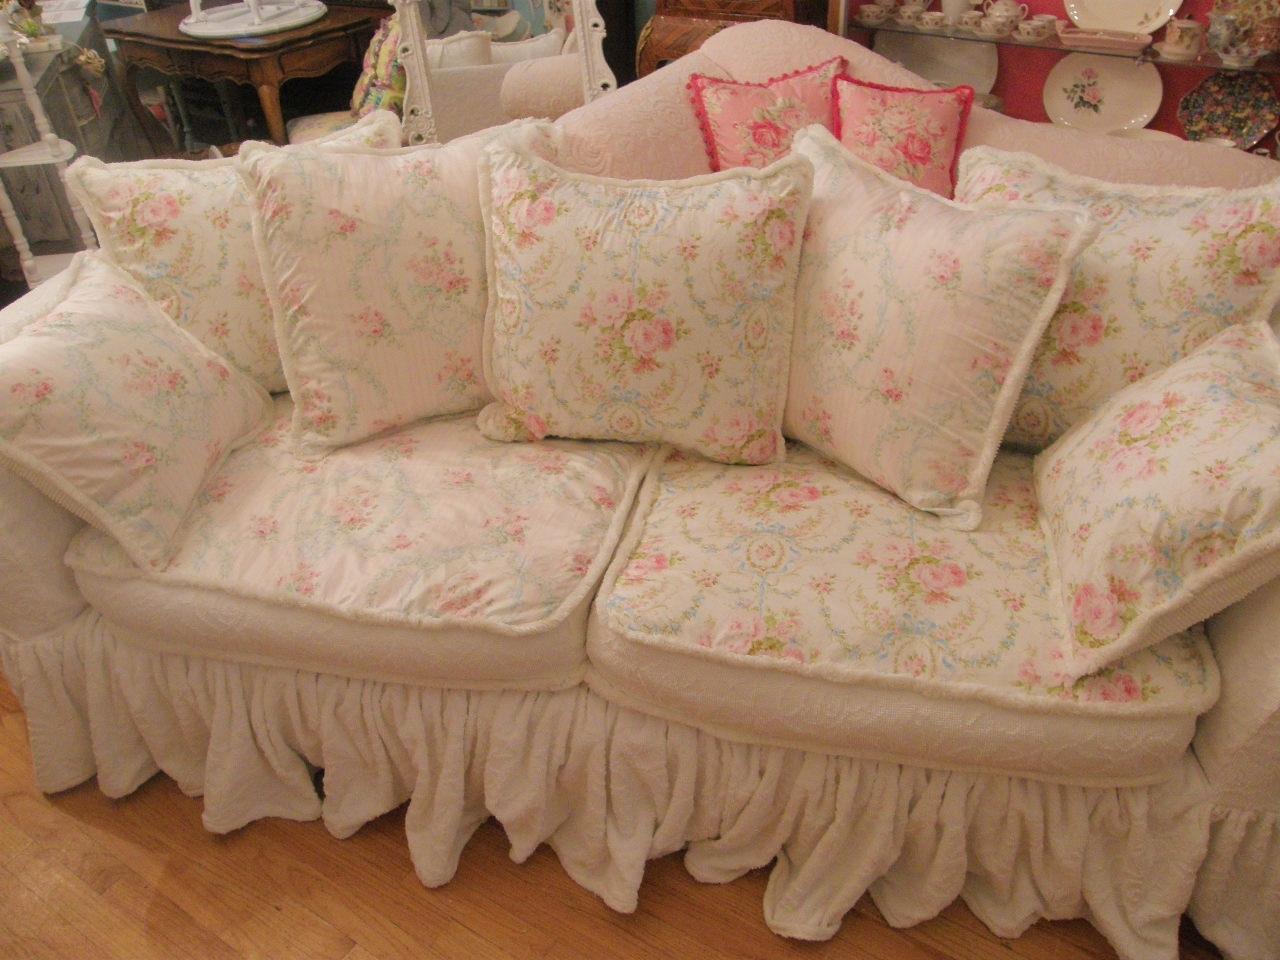 Shabby Chic Sofas 74 With Shabby Chic Sofas | Jinanhongyu Throughout Shabby Chic Sofas (Image 10 of 10)